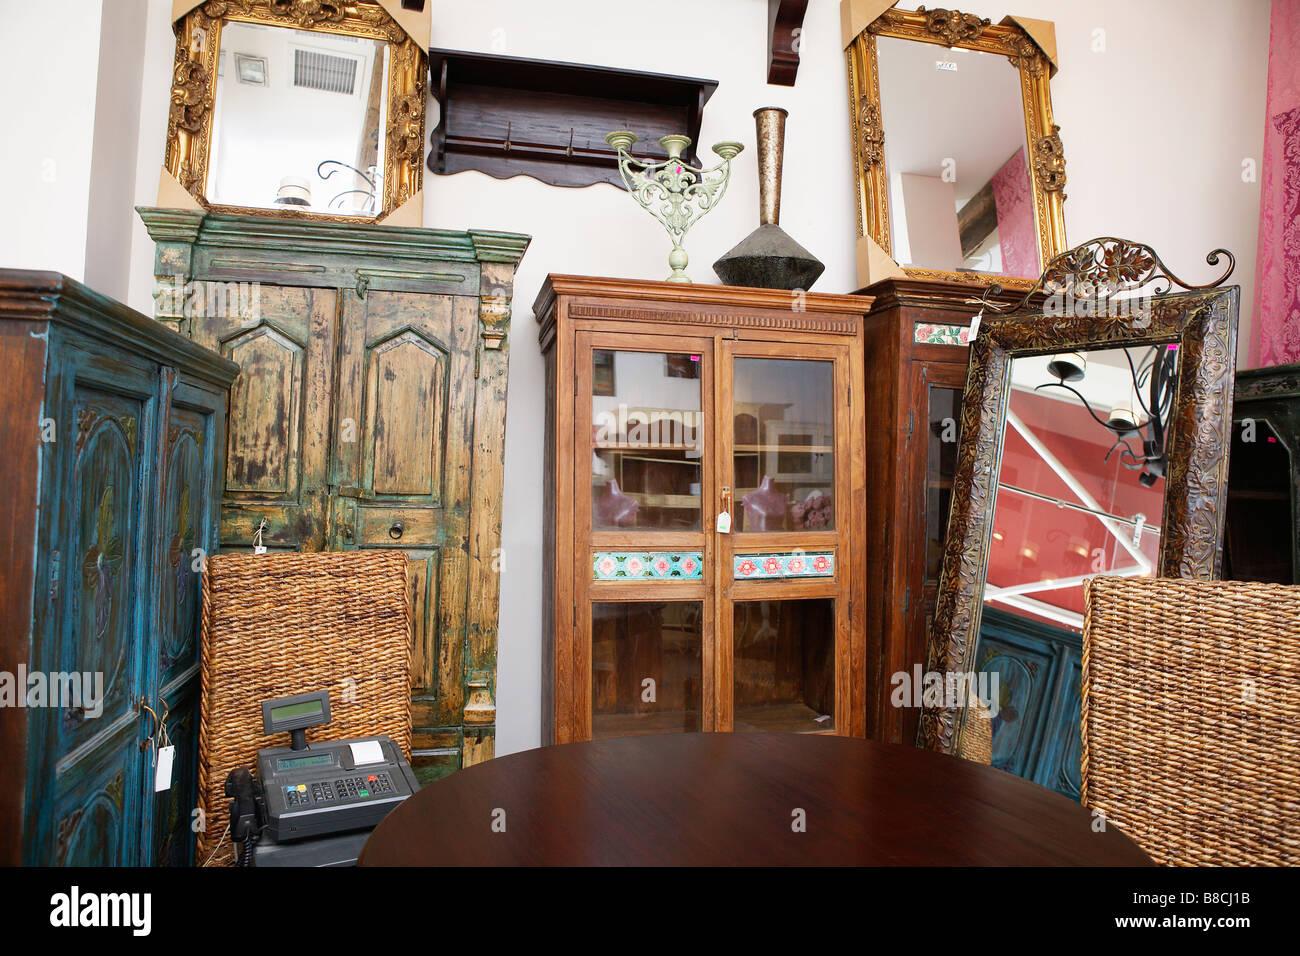 Gebrauchte Büromöbel Shop Stockfoto Bild 22405191 Alamy